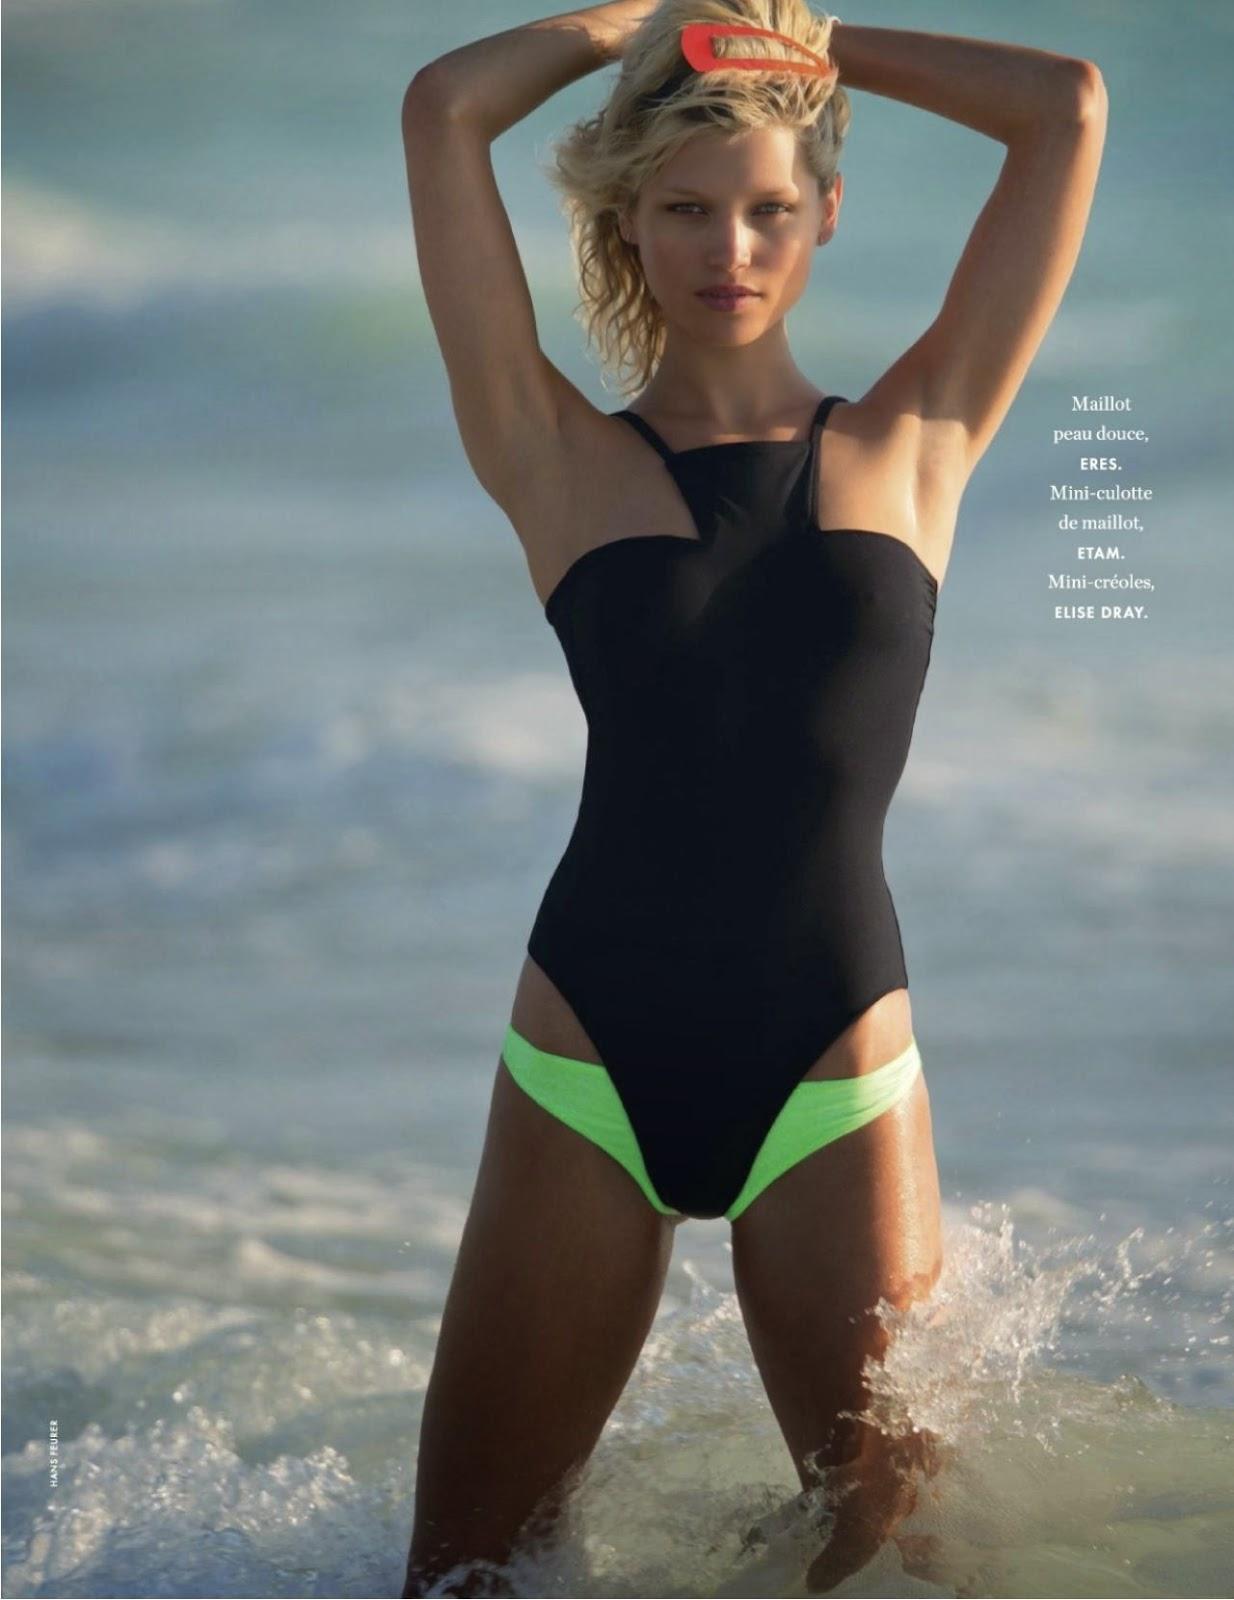 Hana Jirickova - Elle France Magazine